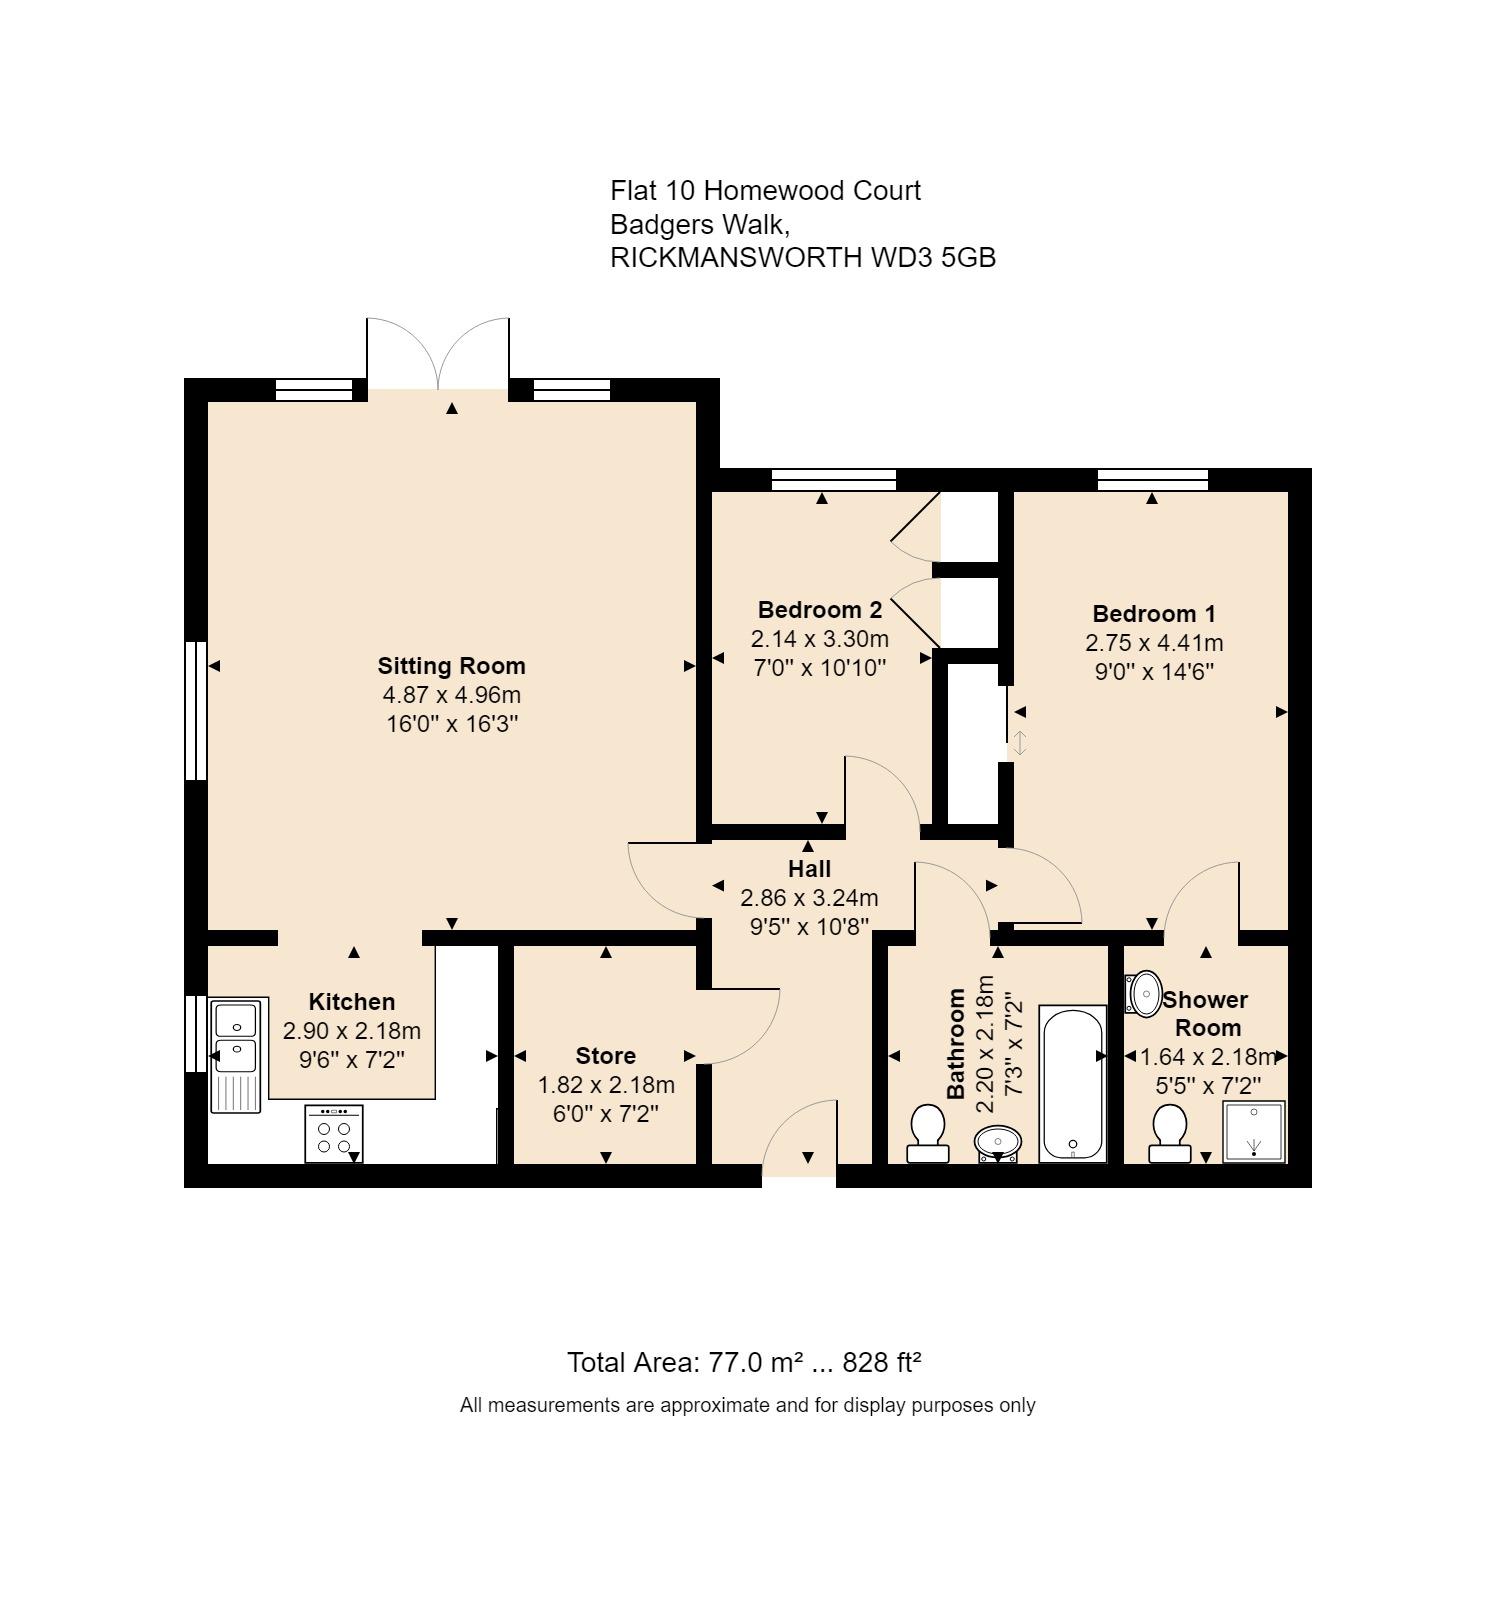 10 Homewood Court Floorplan